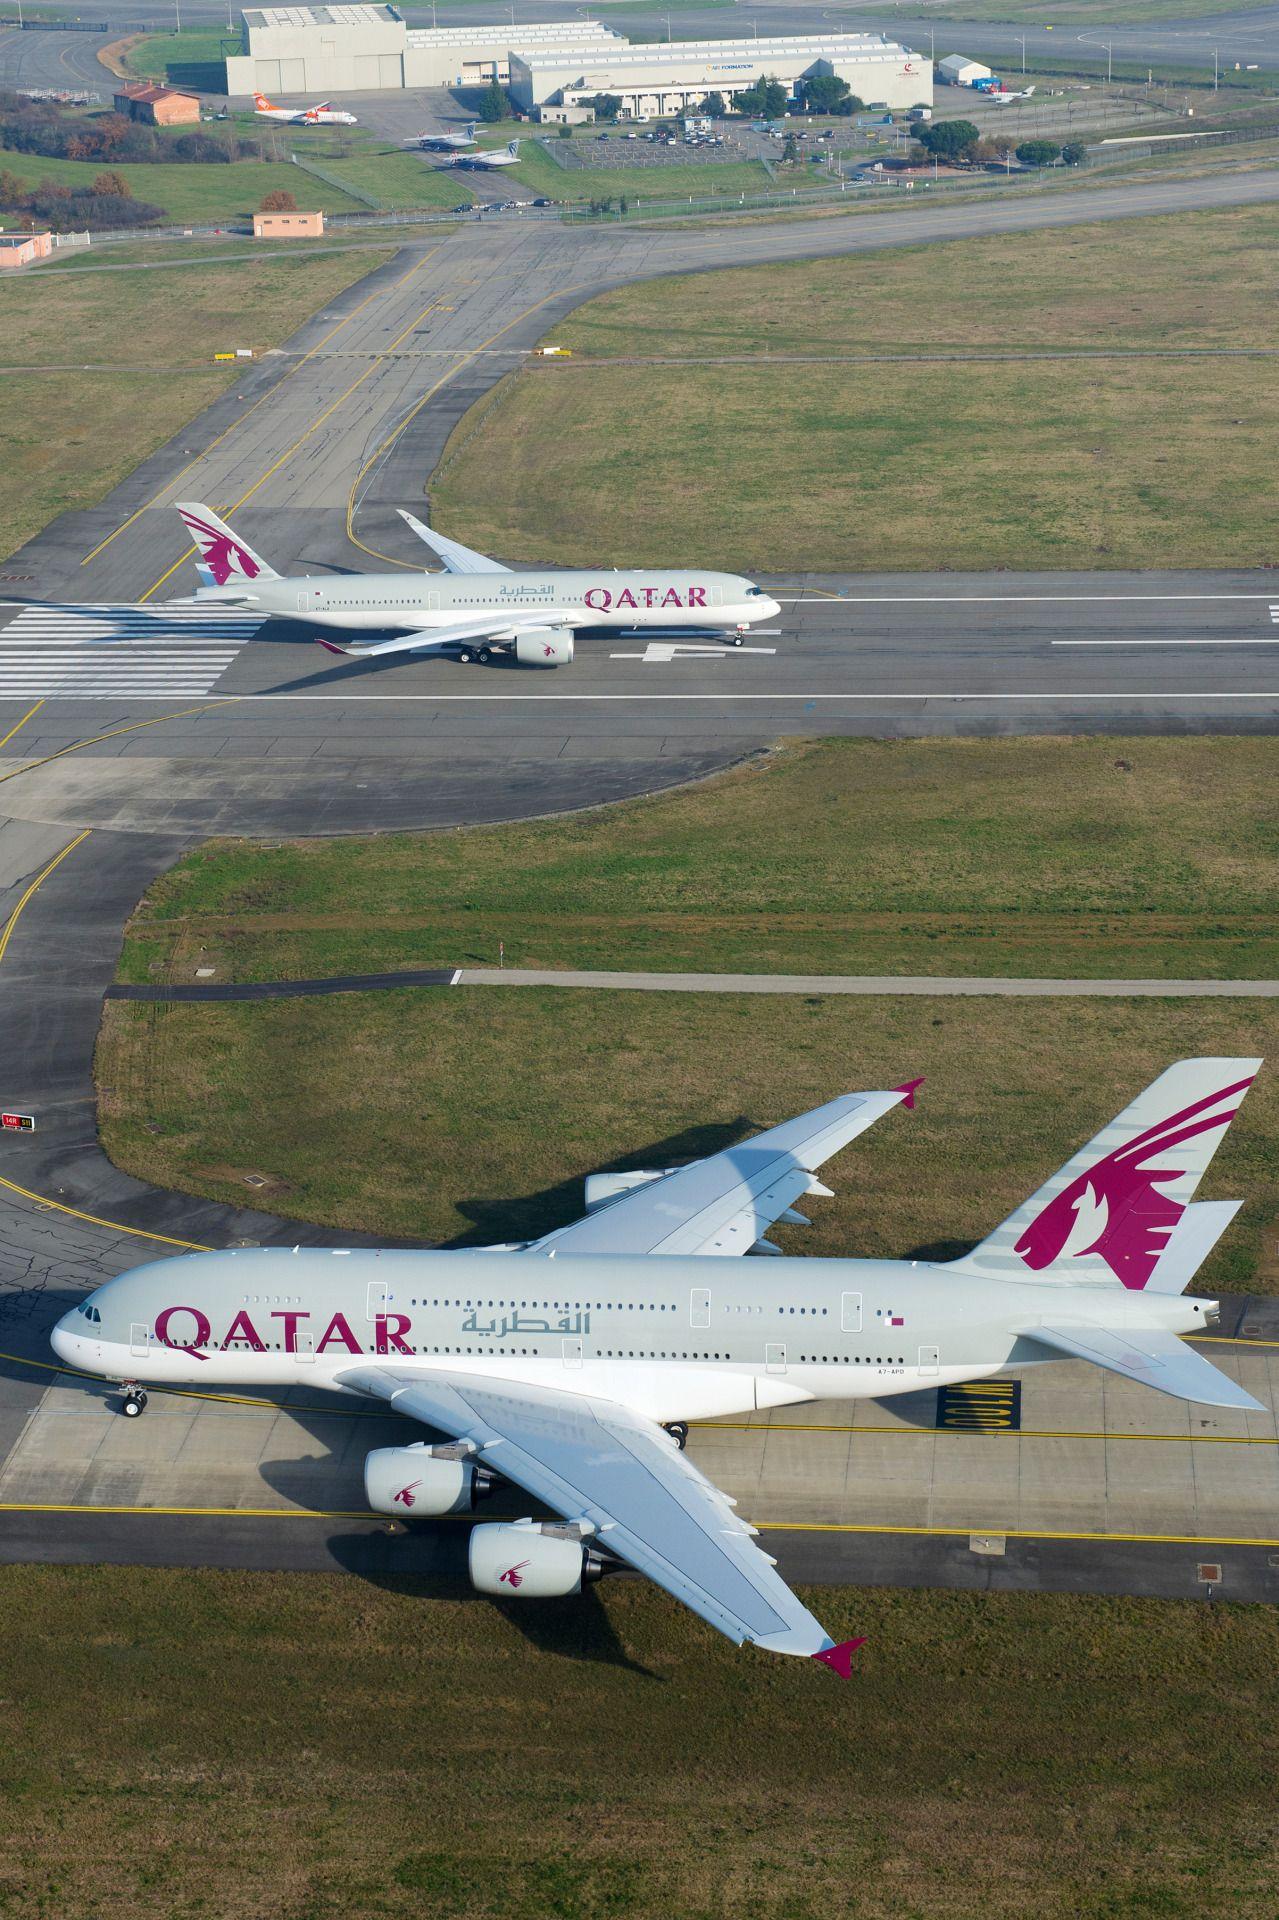 Qatar Airways Airbus A380 & A350. Get substantial discounts at Qatar Airway using Discount & Voucher Codes.